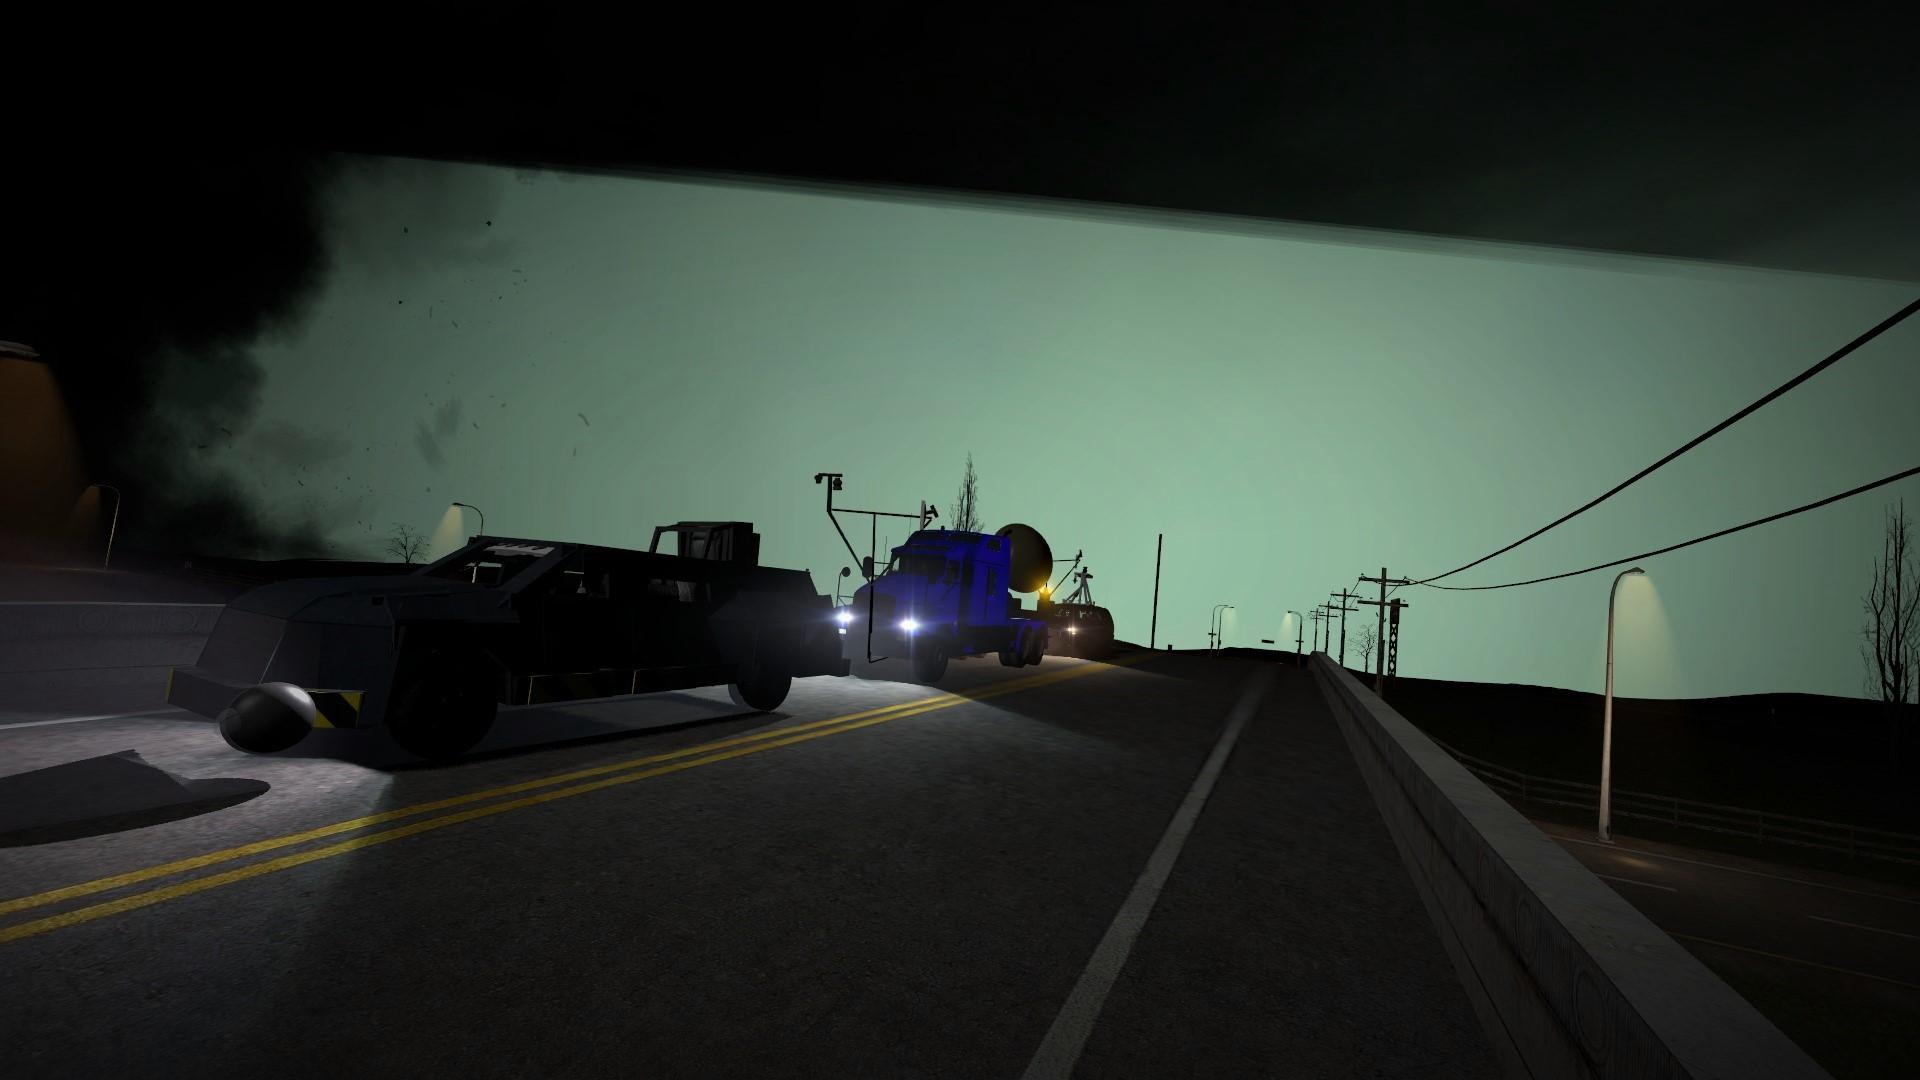 Steam Workshop :: Super Storm Chasing Addons on minecraft tornado map, gmod tornado survival, gmod tornado chasers, garrys mod tornado map, gmod tornado game, gmod tornado mod, gmod tornado highway tiv,